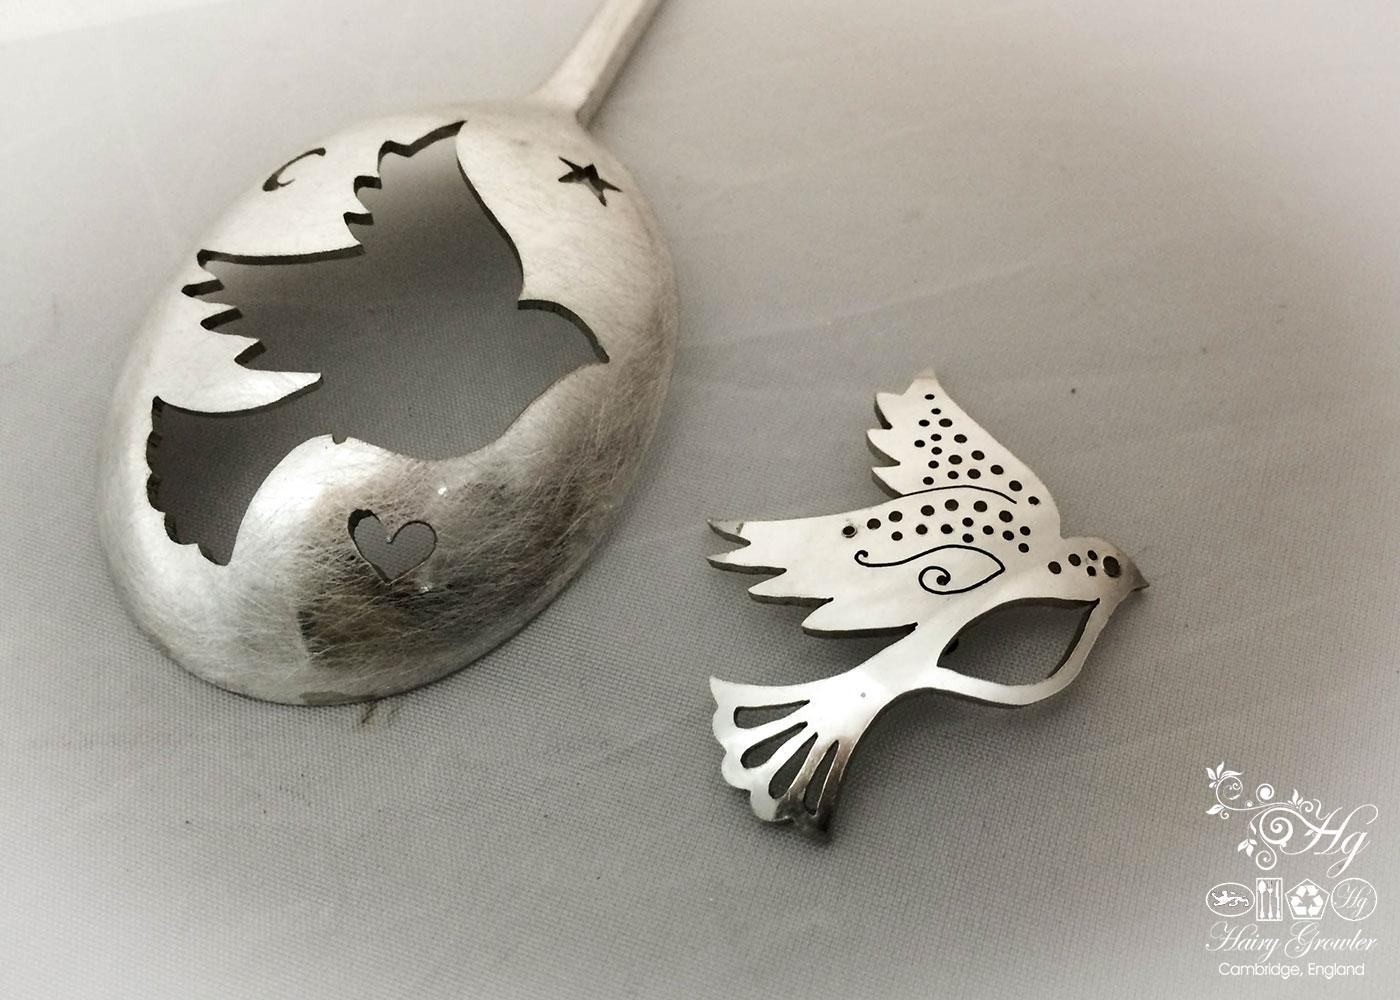 handmade and repurposed peace dove spoon brooch jewellery